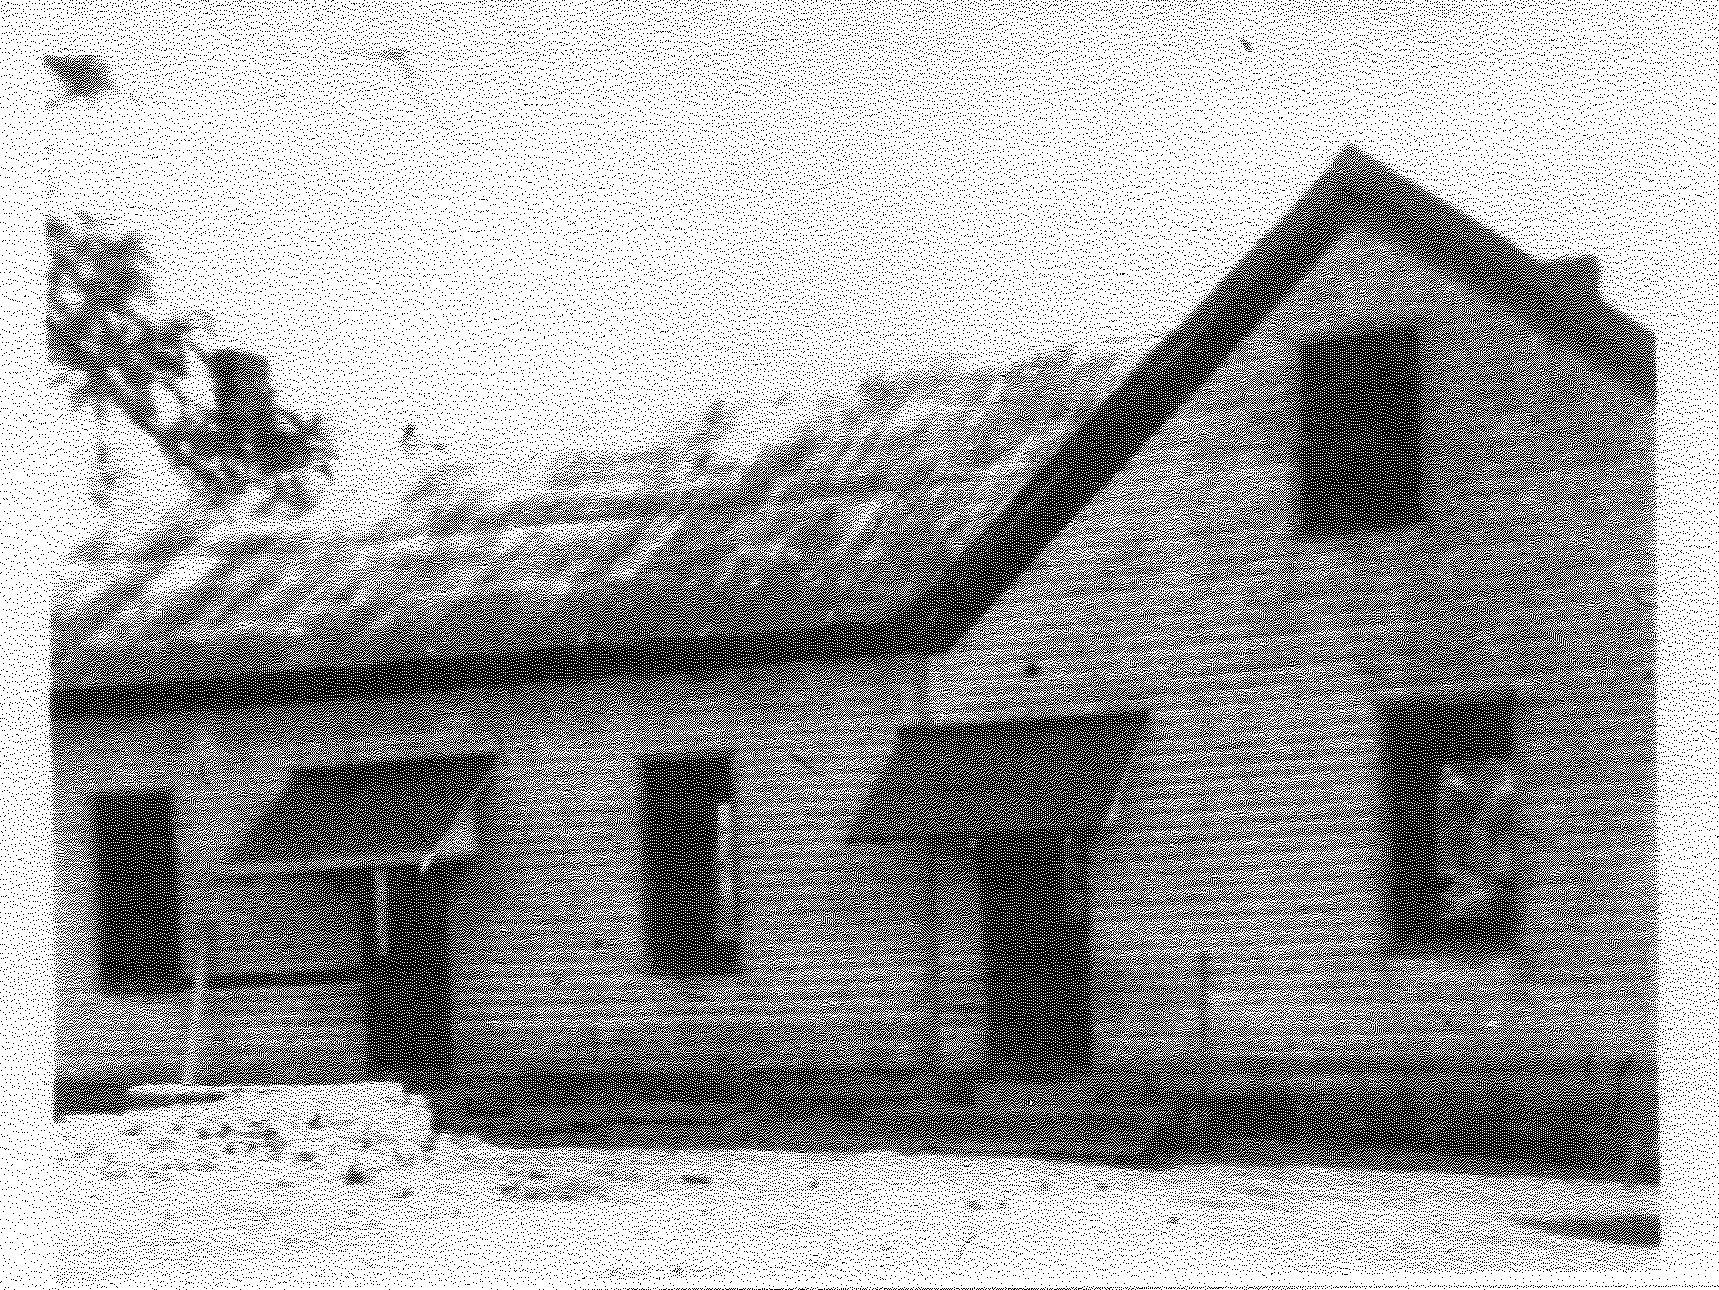 1877_1951_School building.jpg